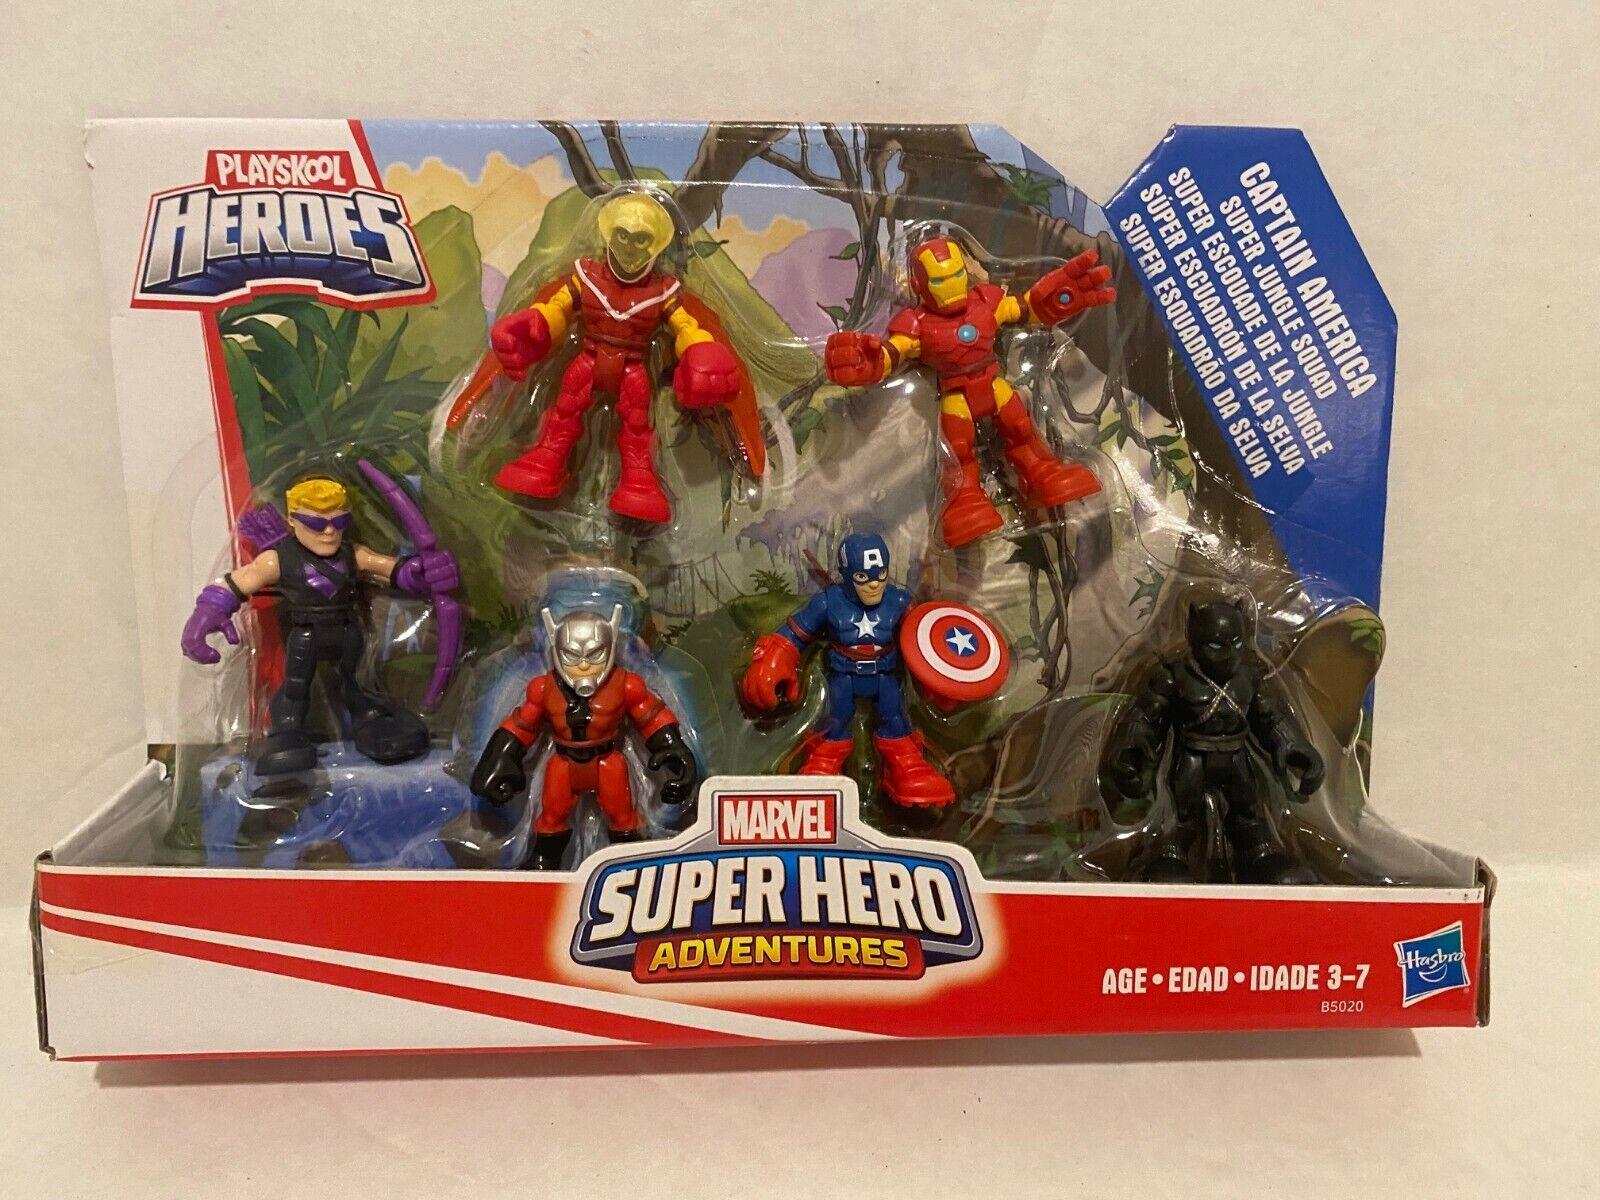 Playskool Heroes Super Hero Adventures Captain America Figure Pack Jungle Squad